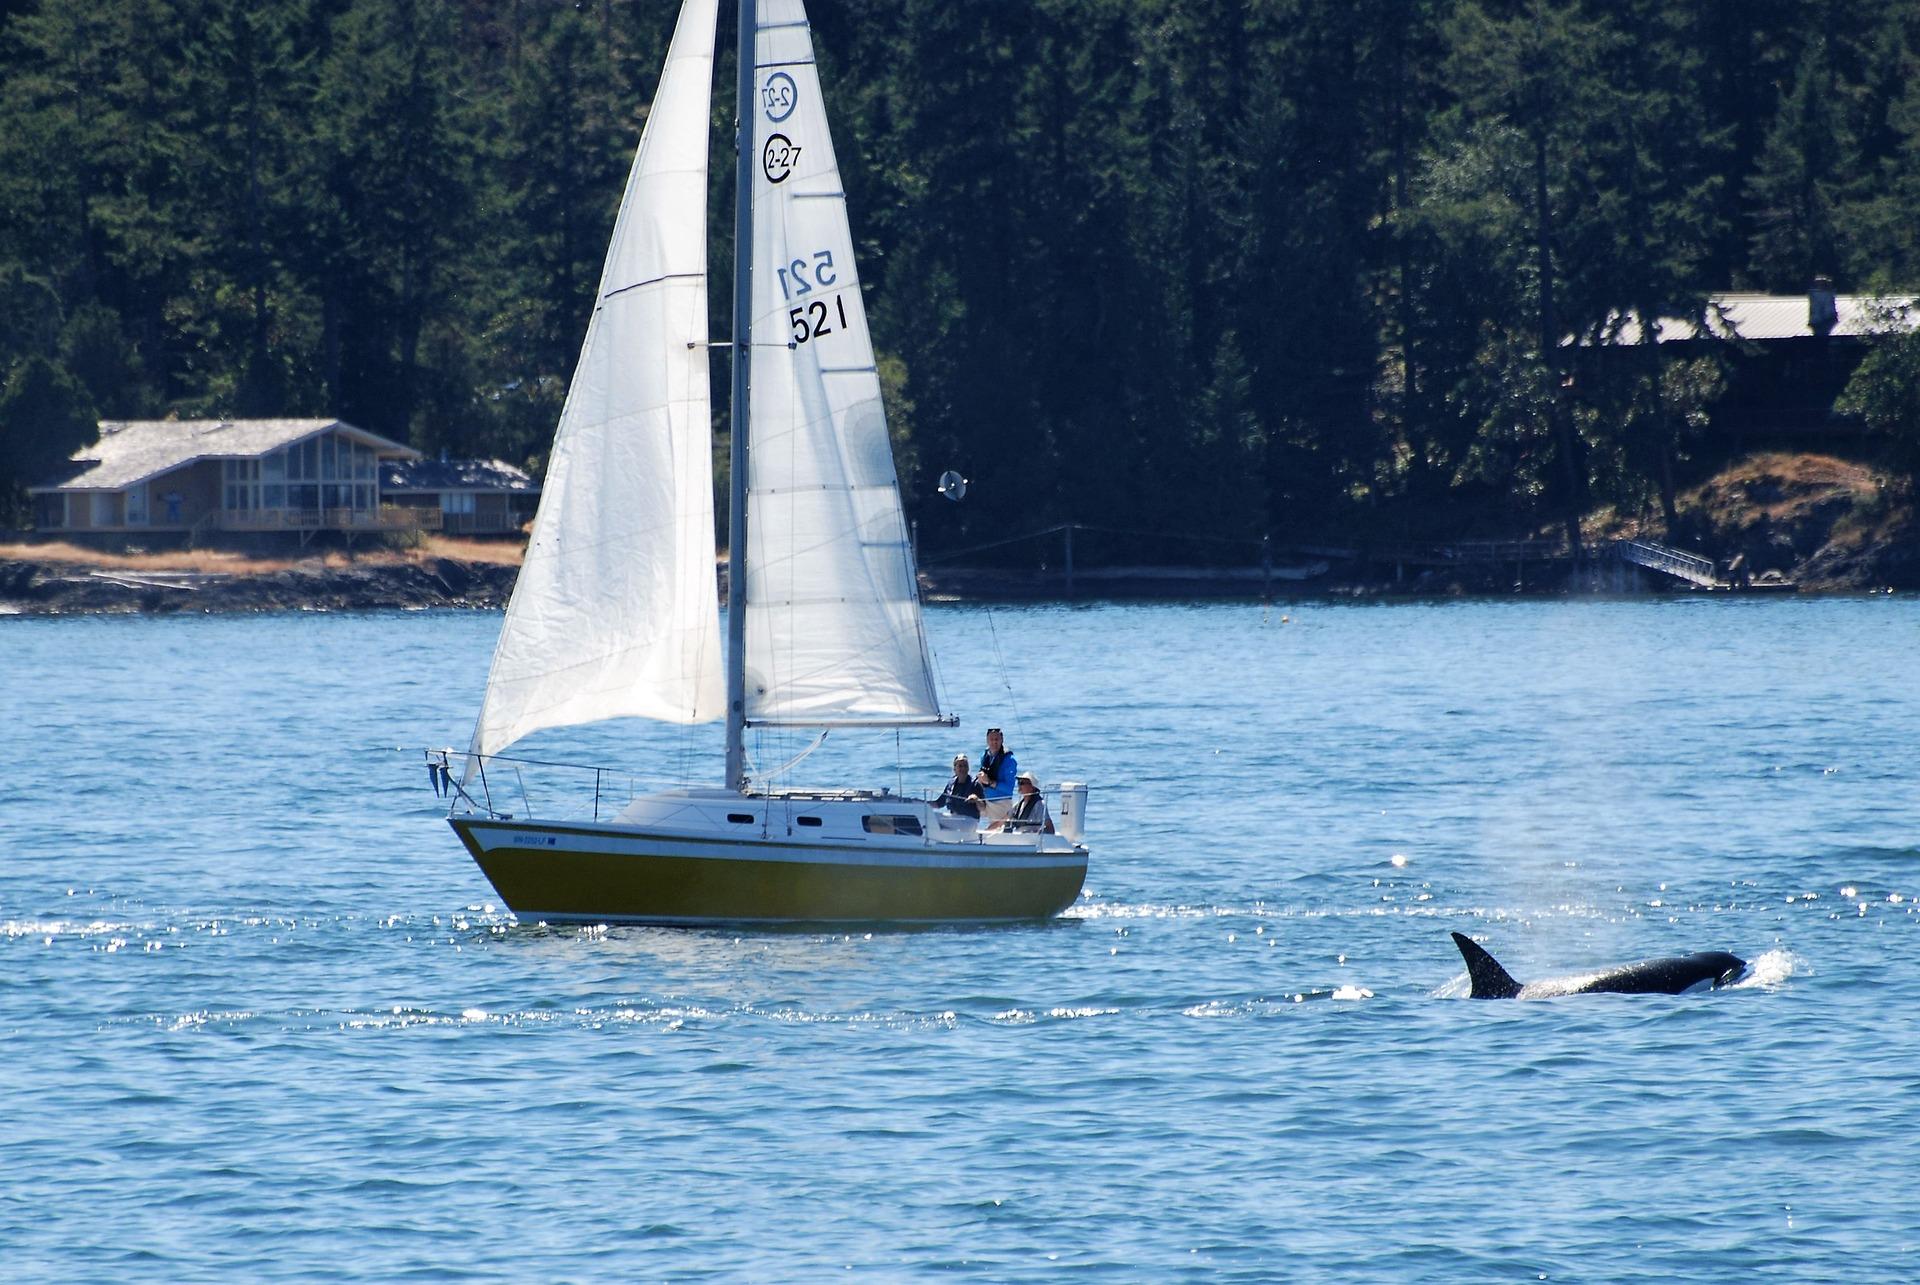 sailing-boat-3592517_1920.jpg